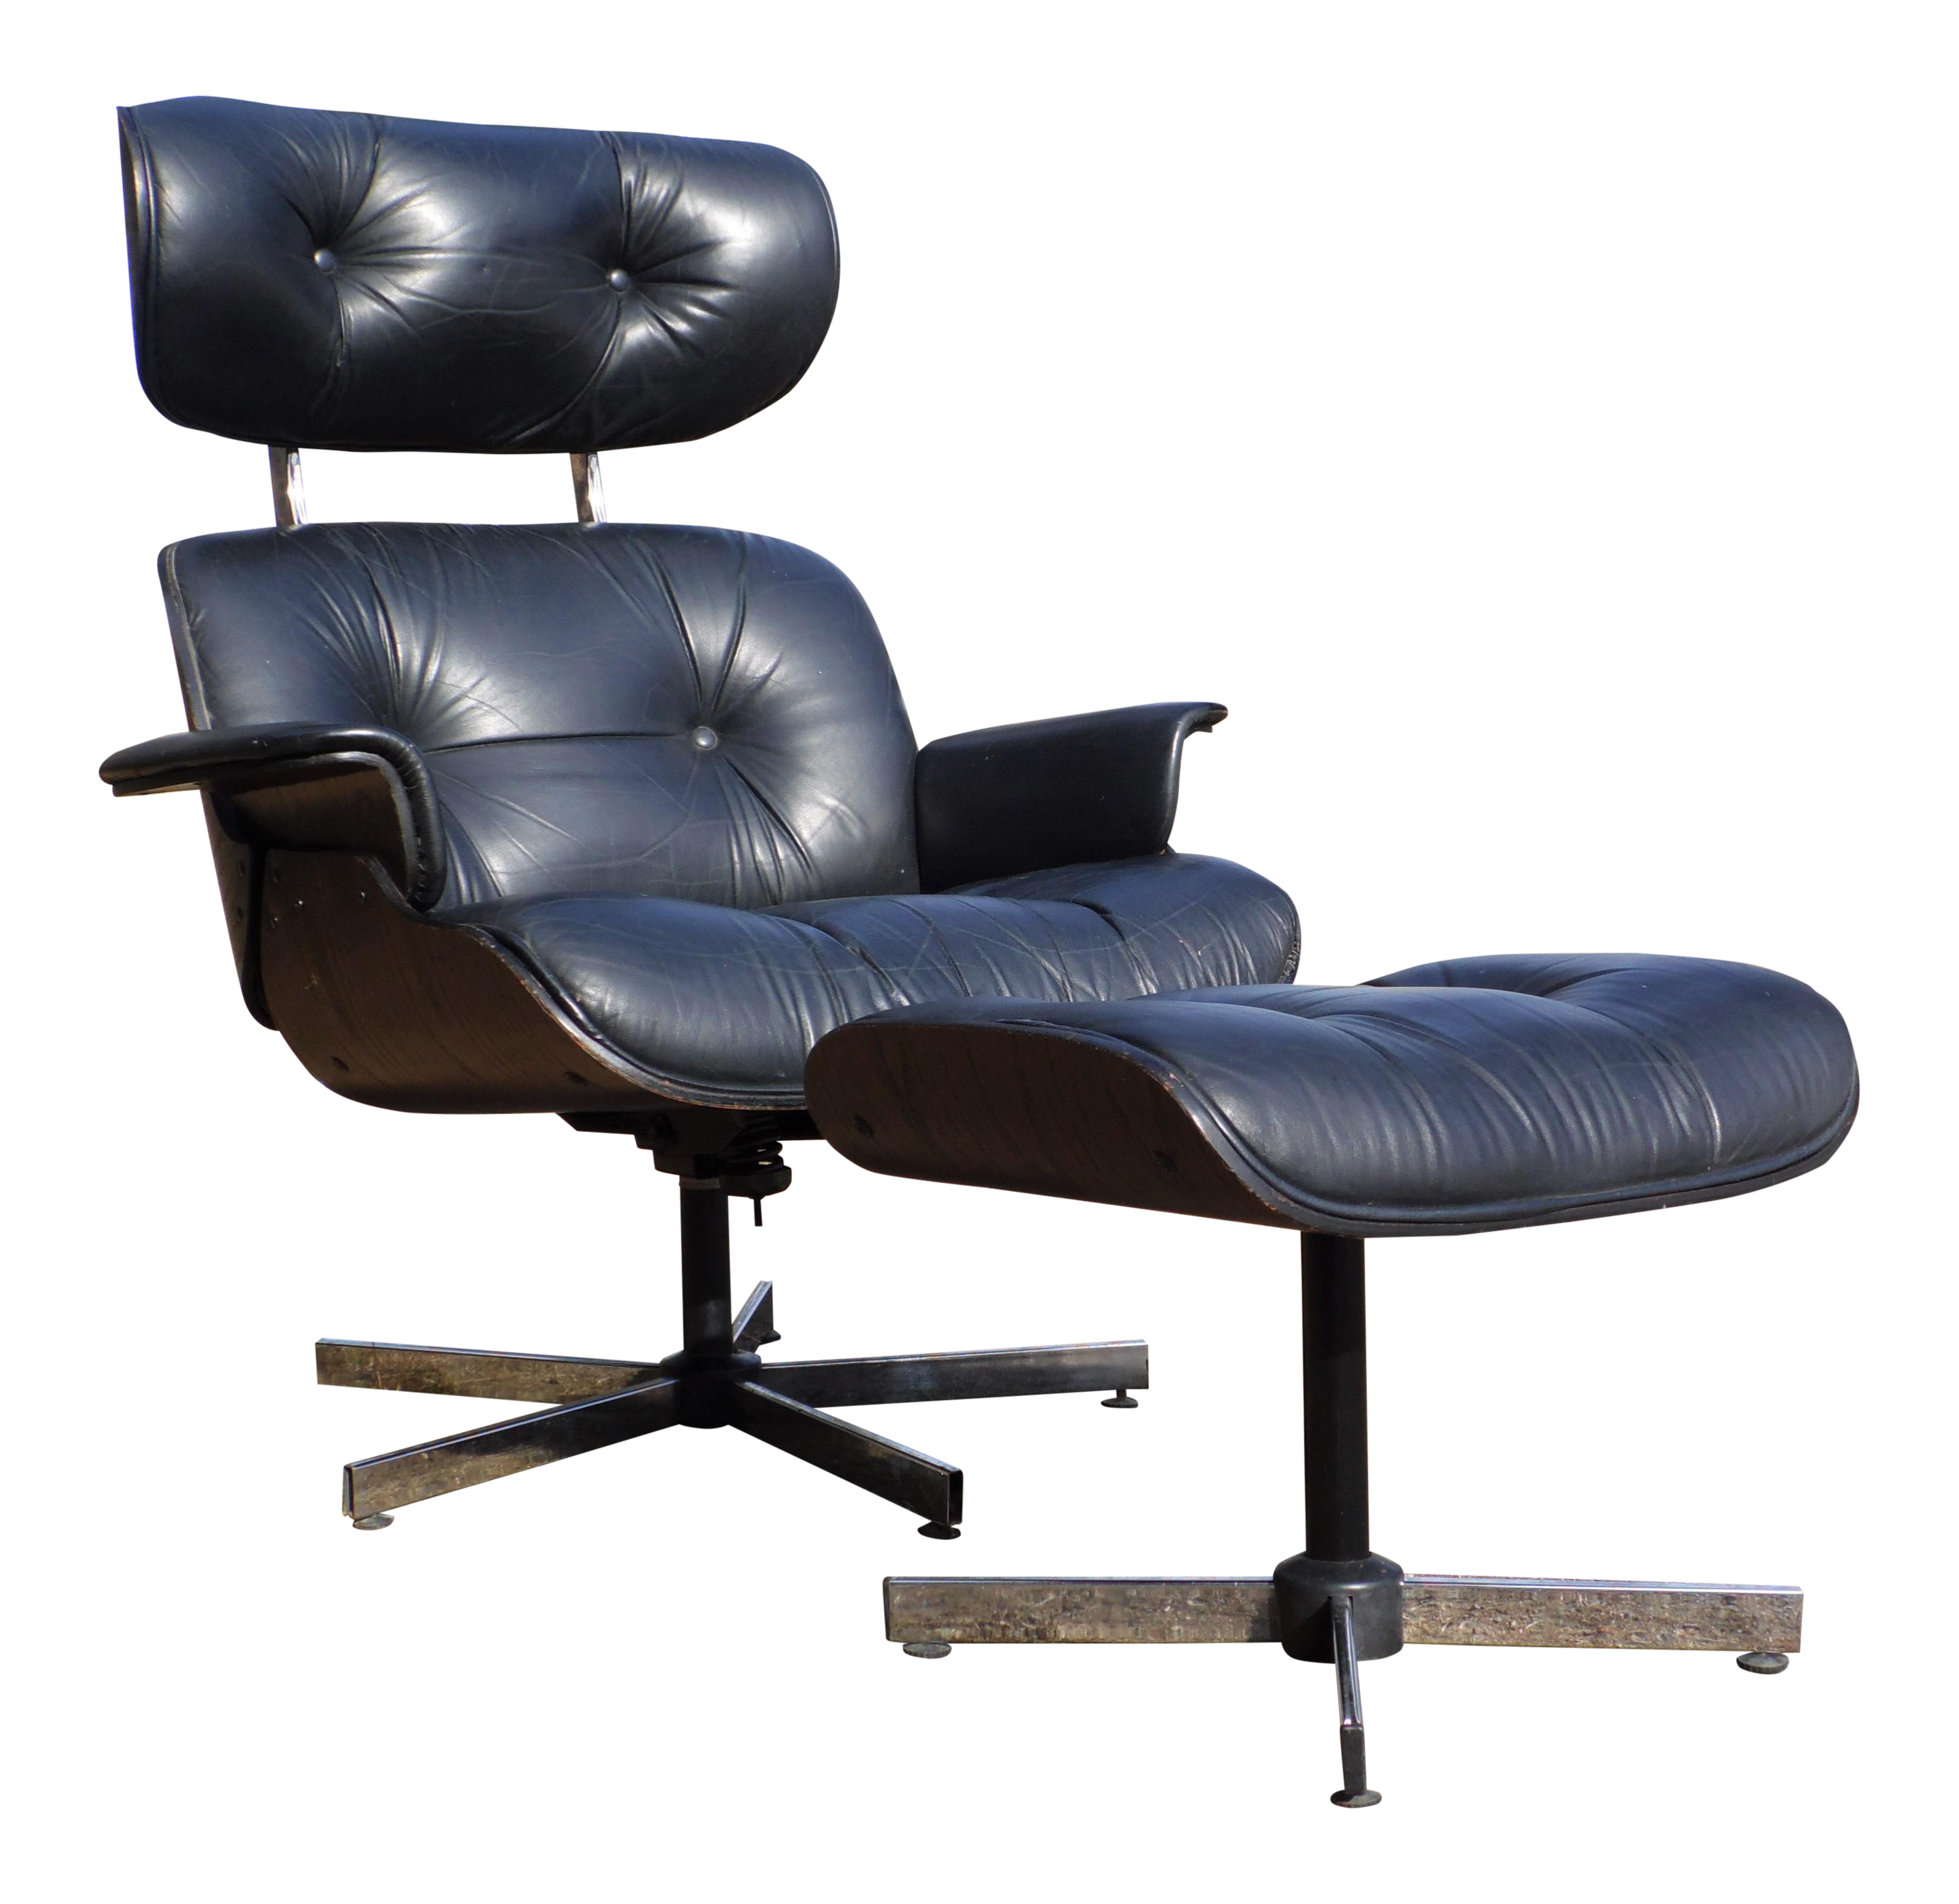 1960s plycraft midcentury lounge chair u0026 ottoman - Mid Century Lounge Chair